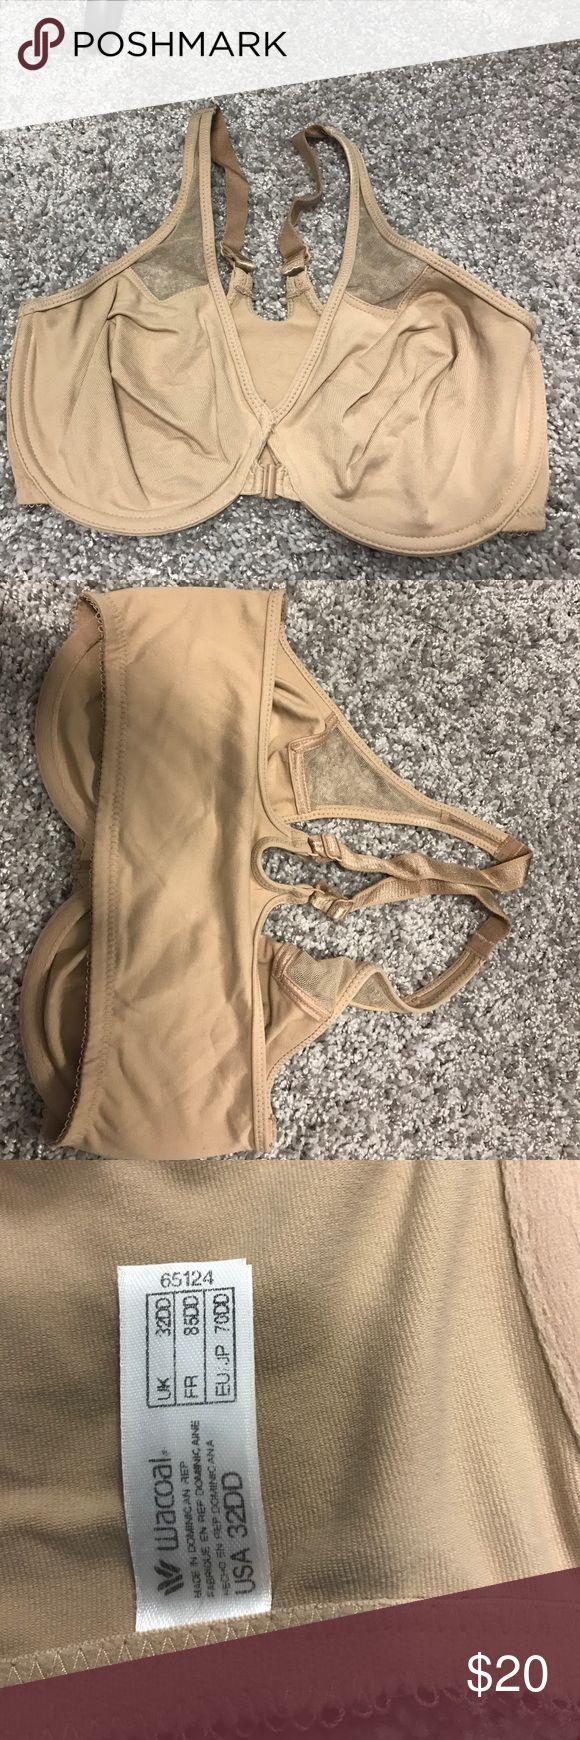 Wacoal bra Front closure nude wacoal bra. Size 32DD Wacoal Intimates & Sleepwear Bras